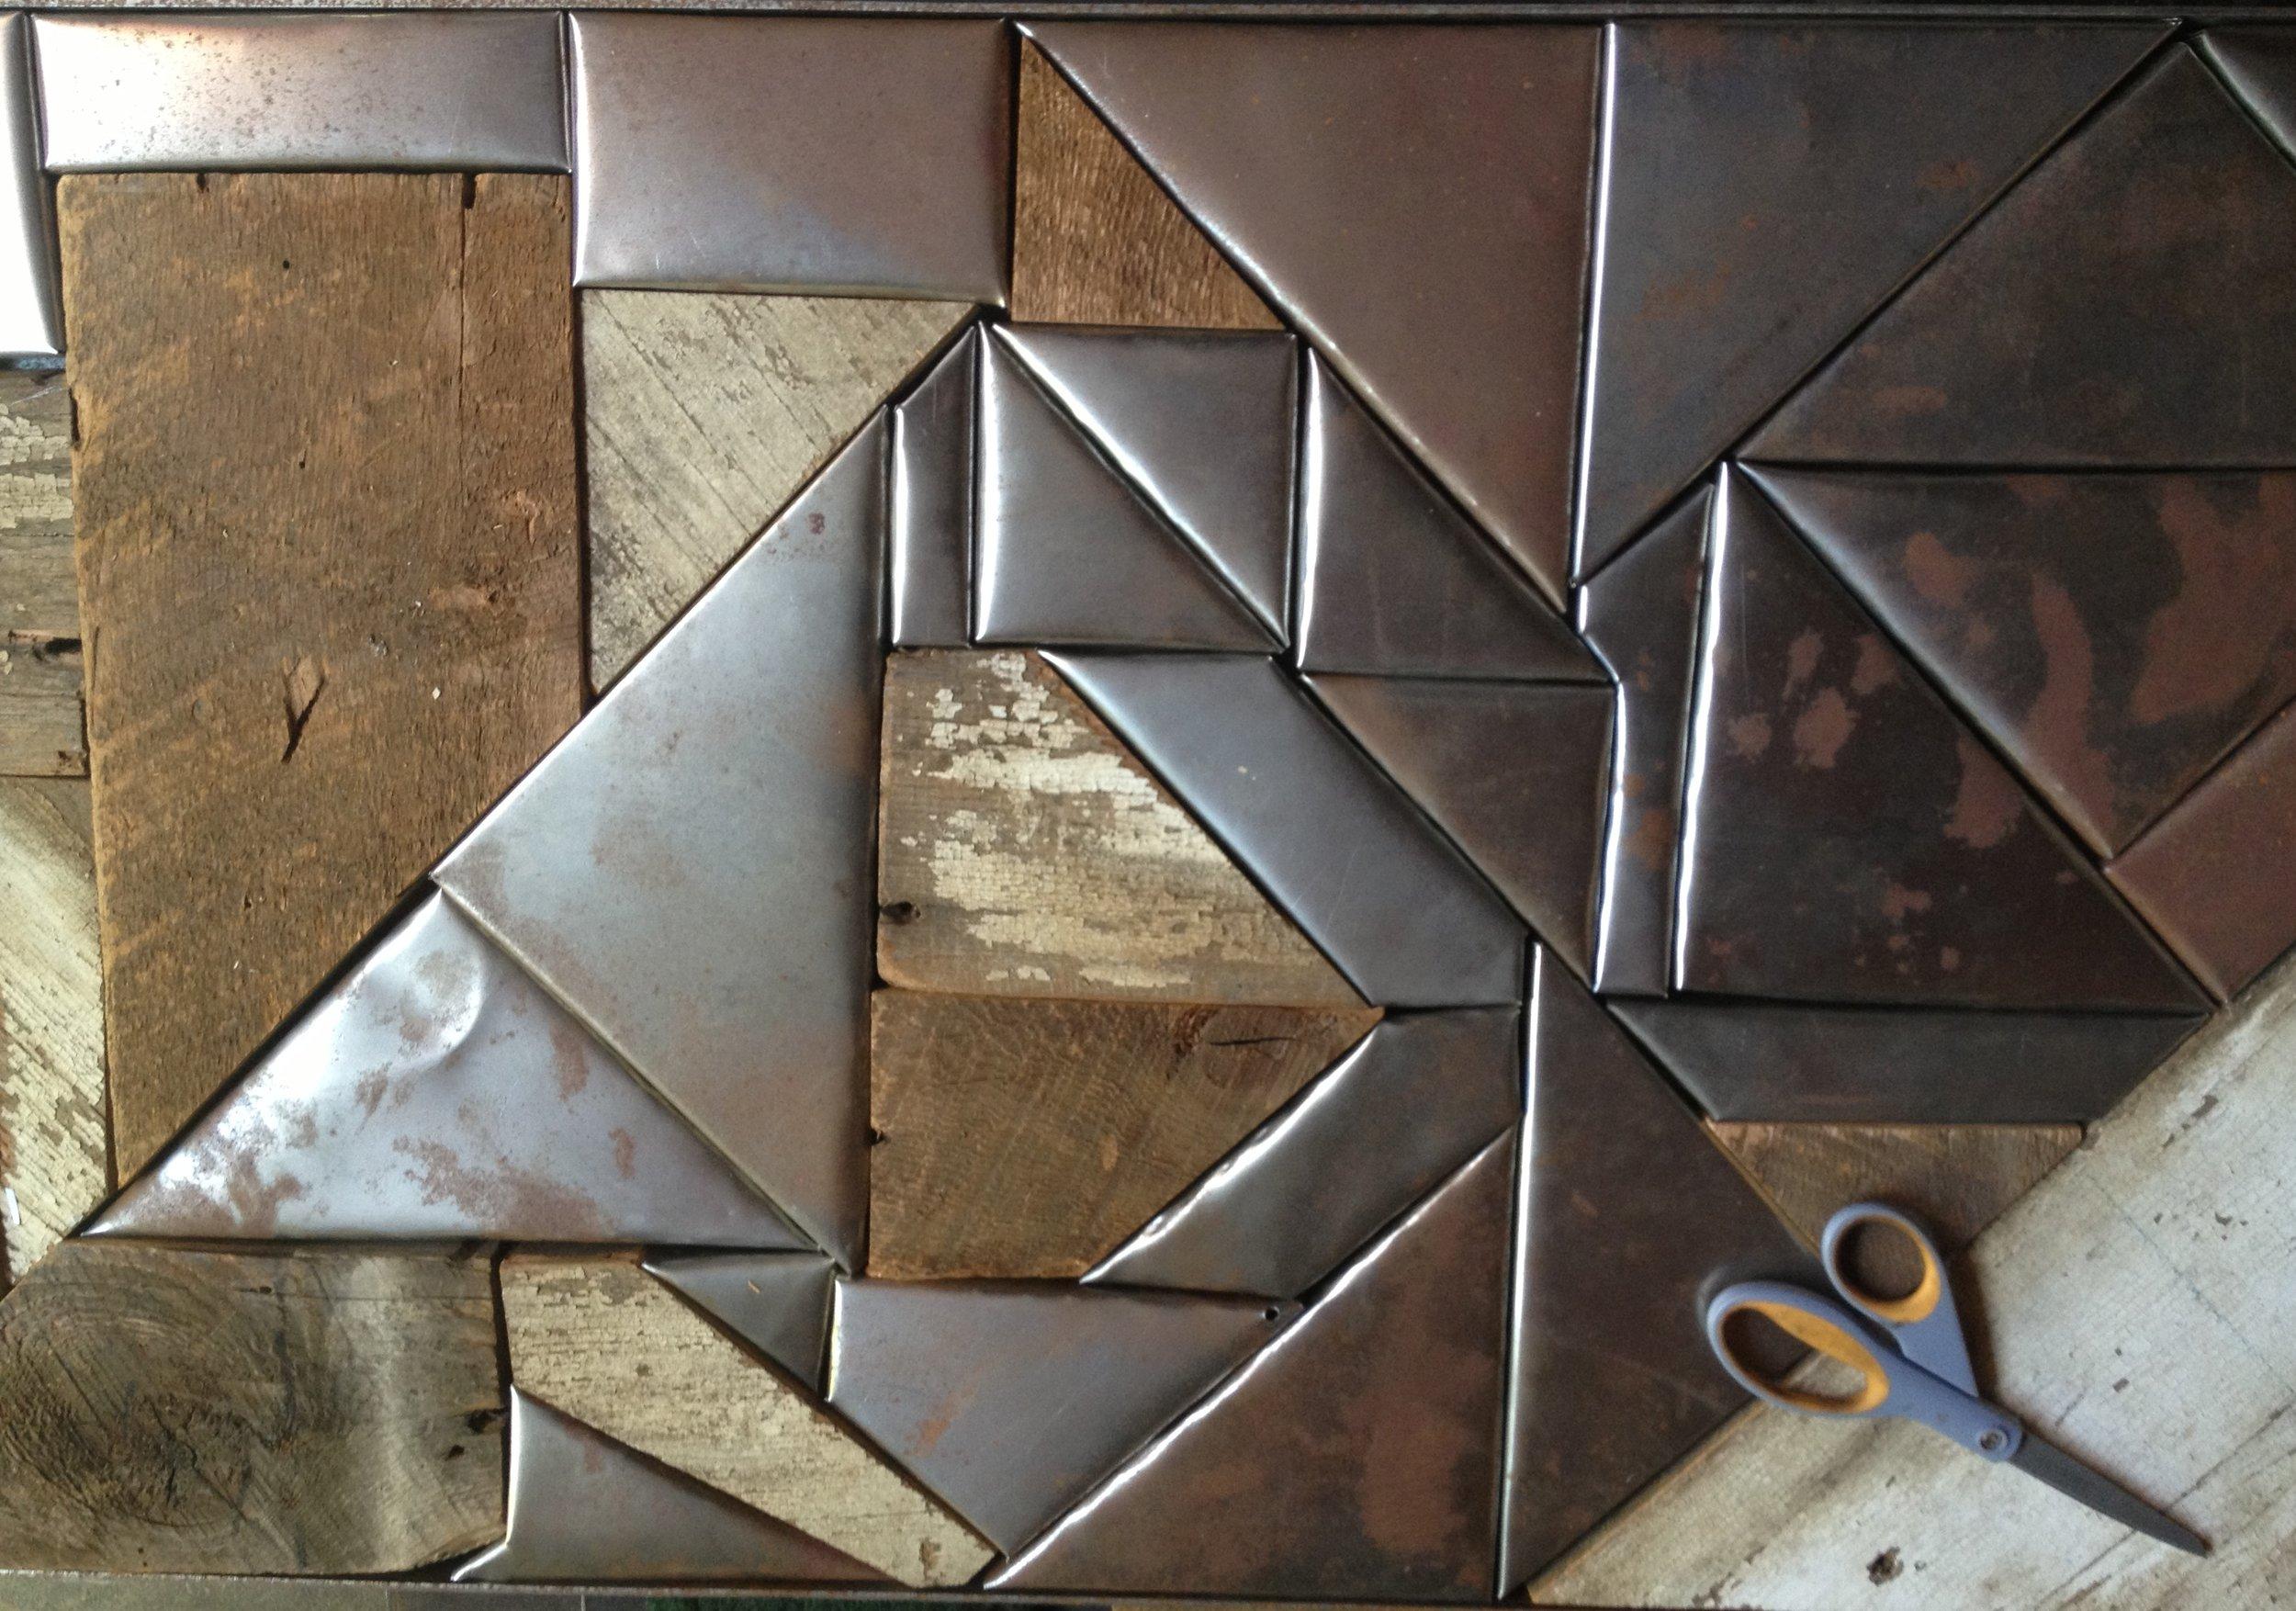 quilt table 2.JPG